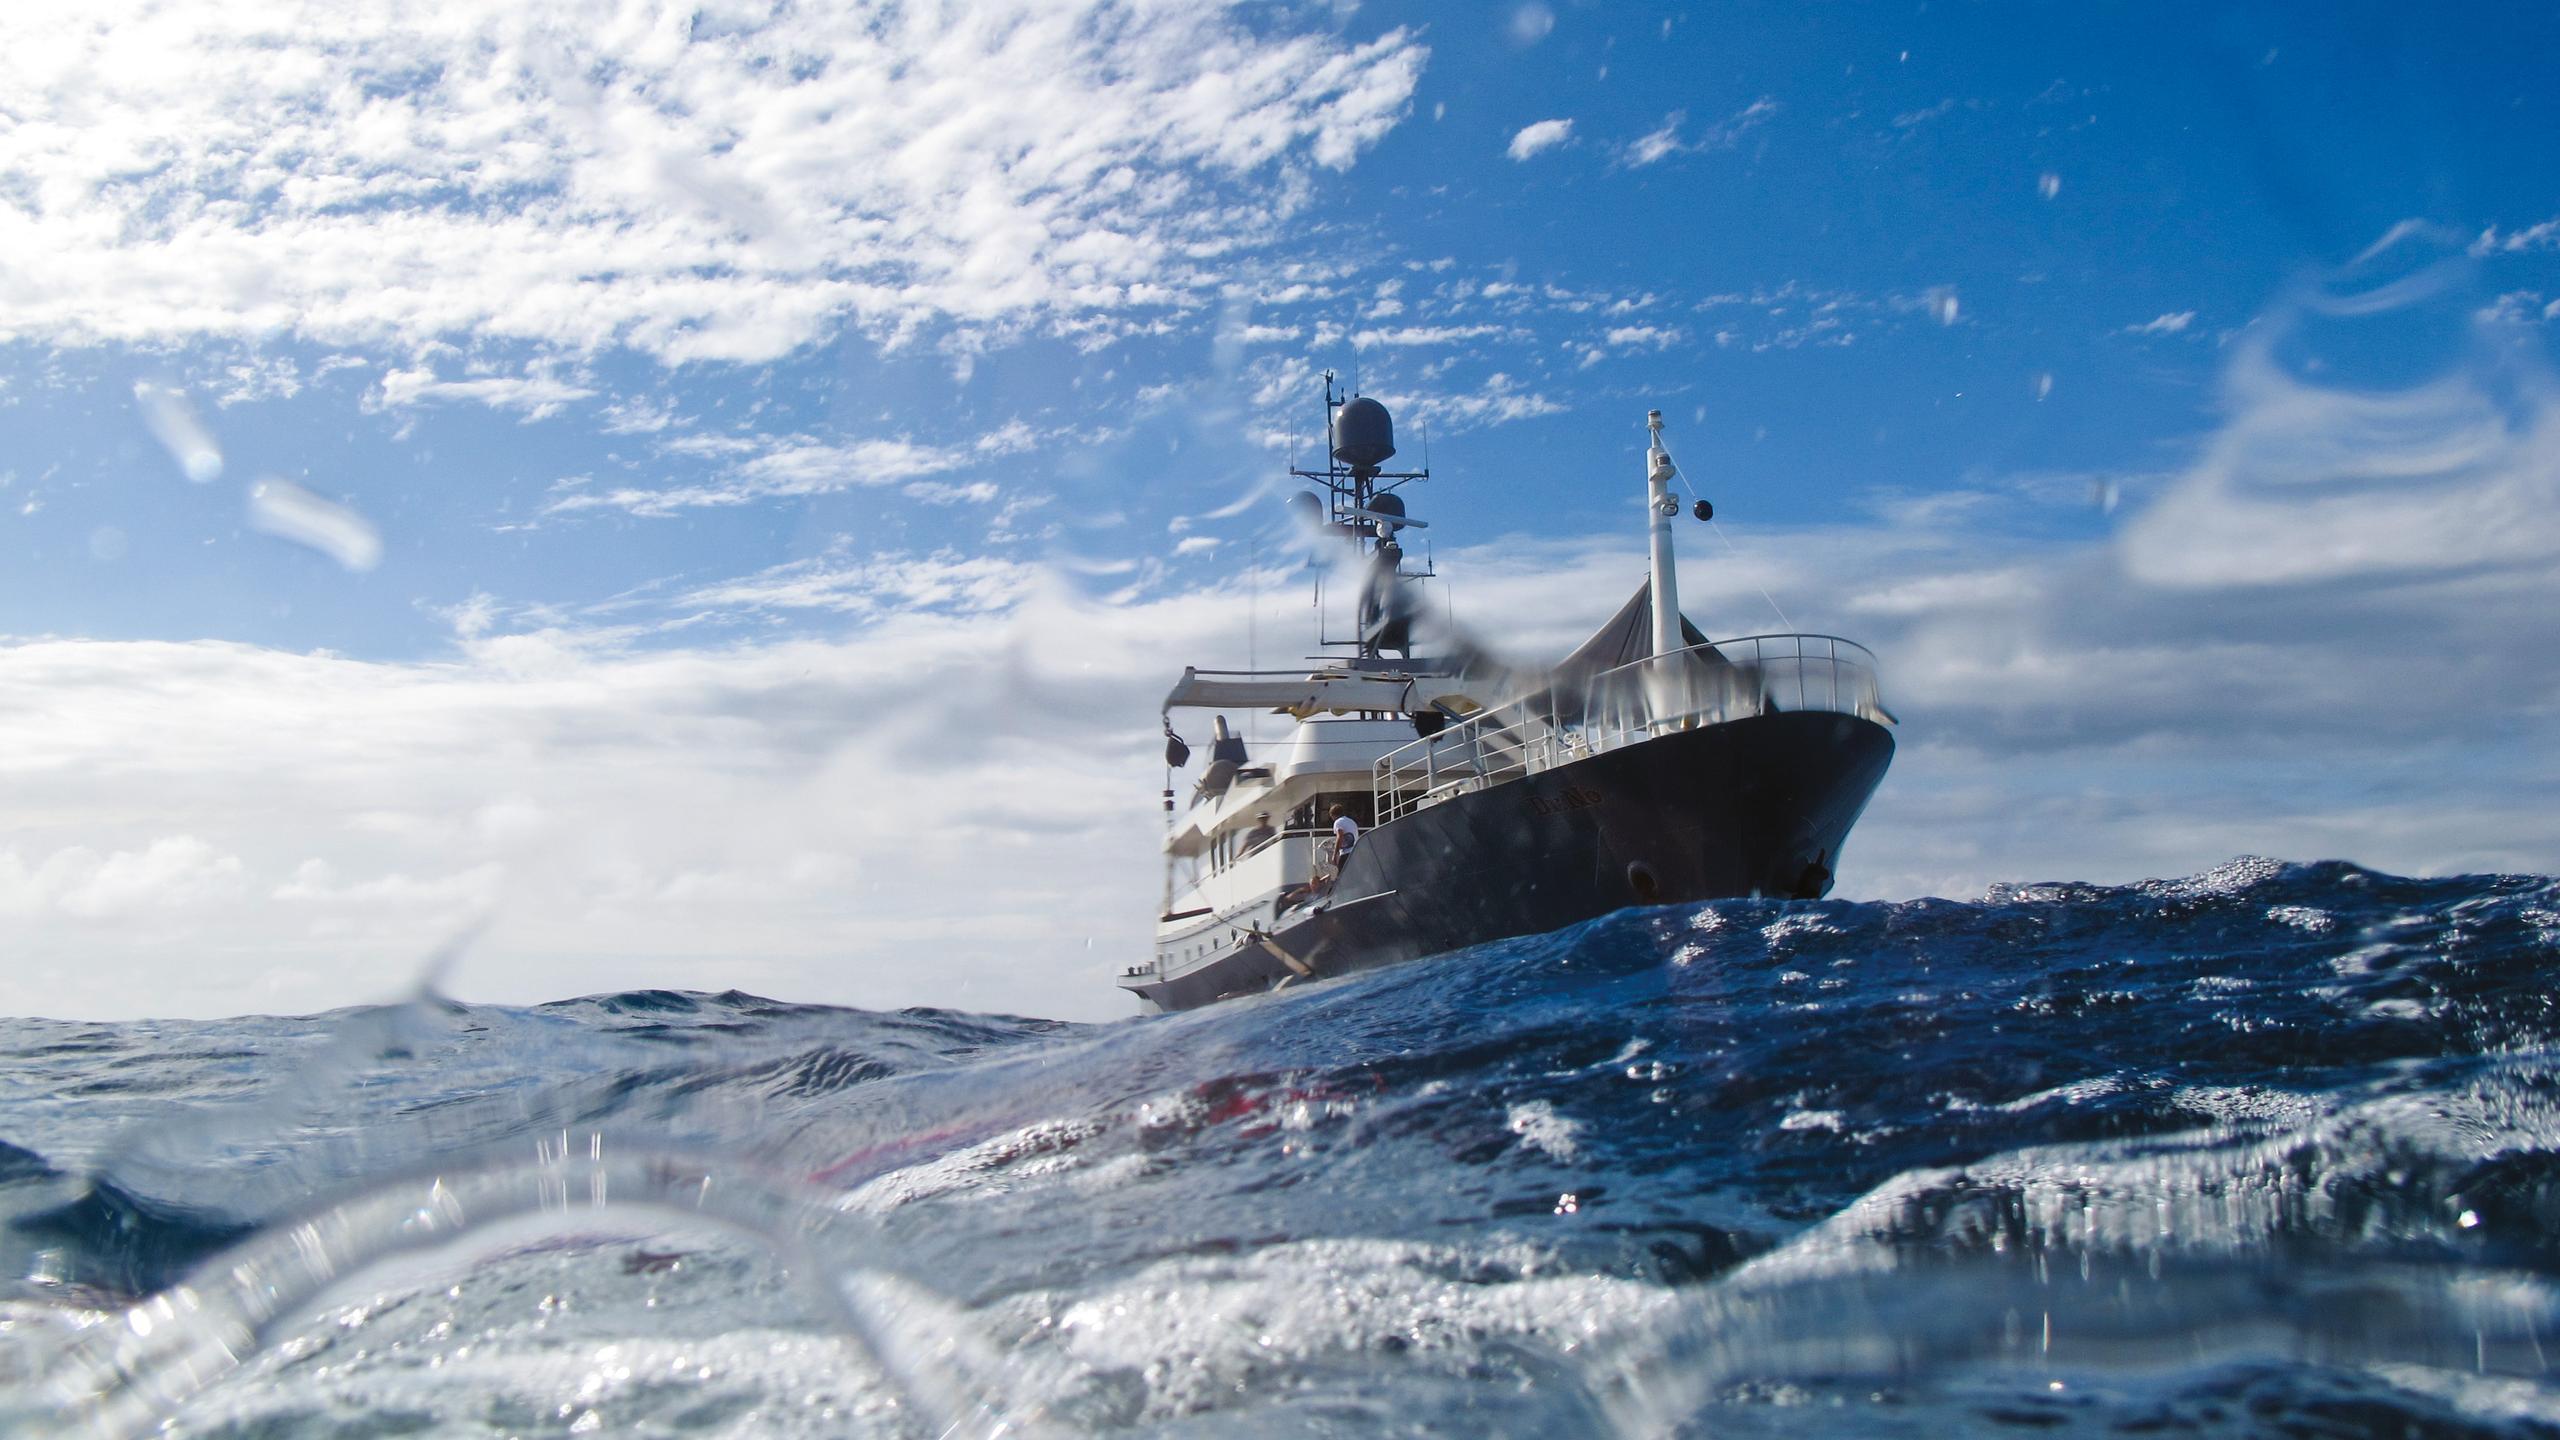 dr-no-explorer-yacht-narasaki-1995-37m-distance